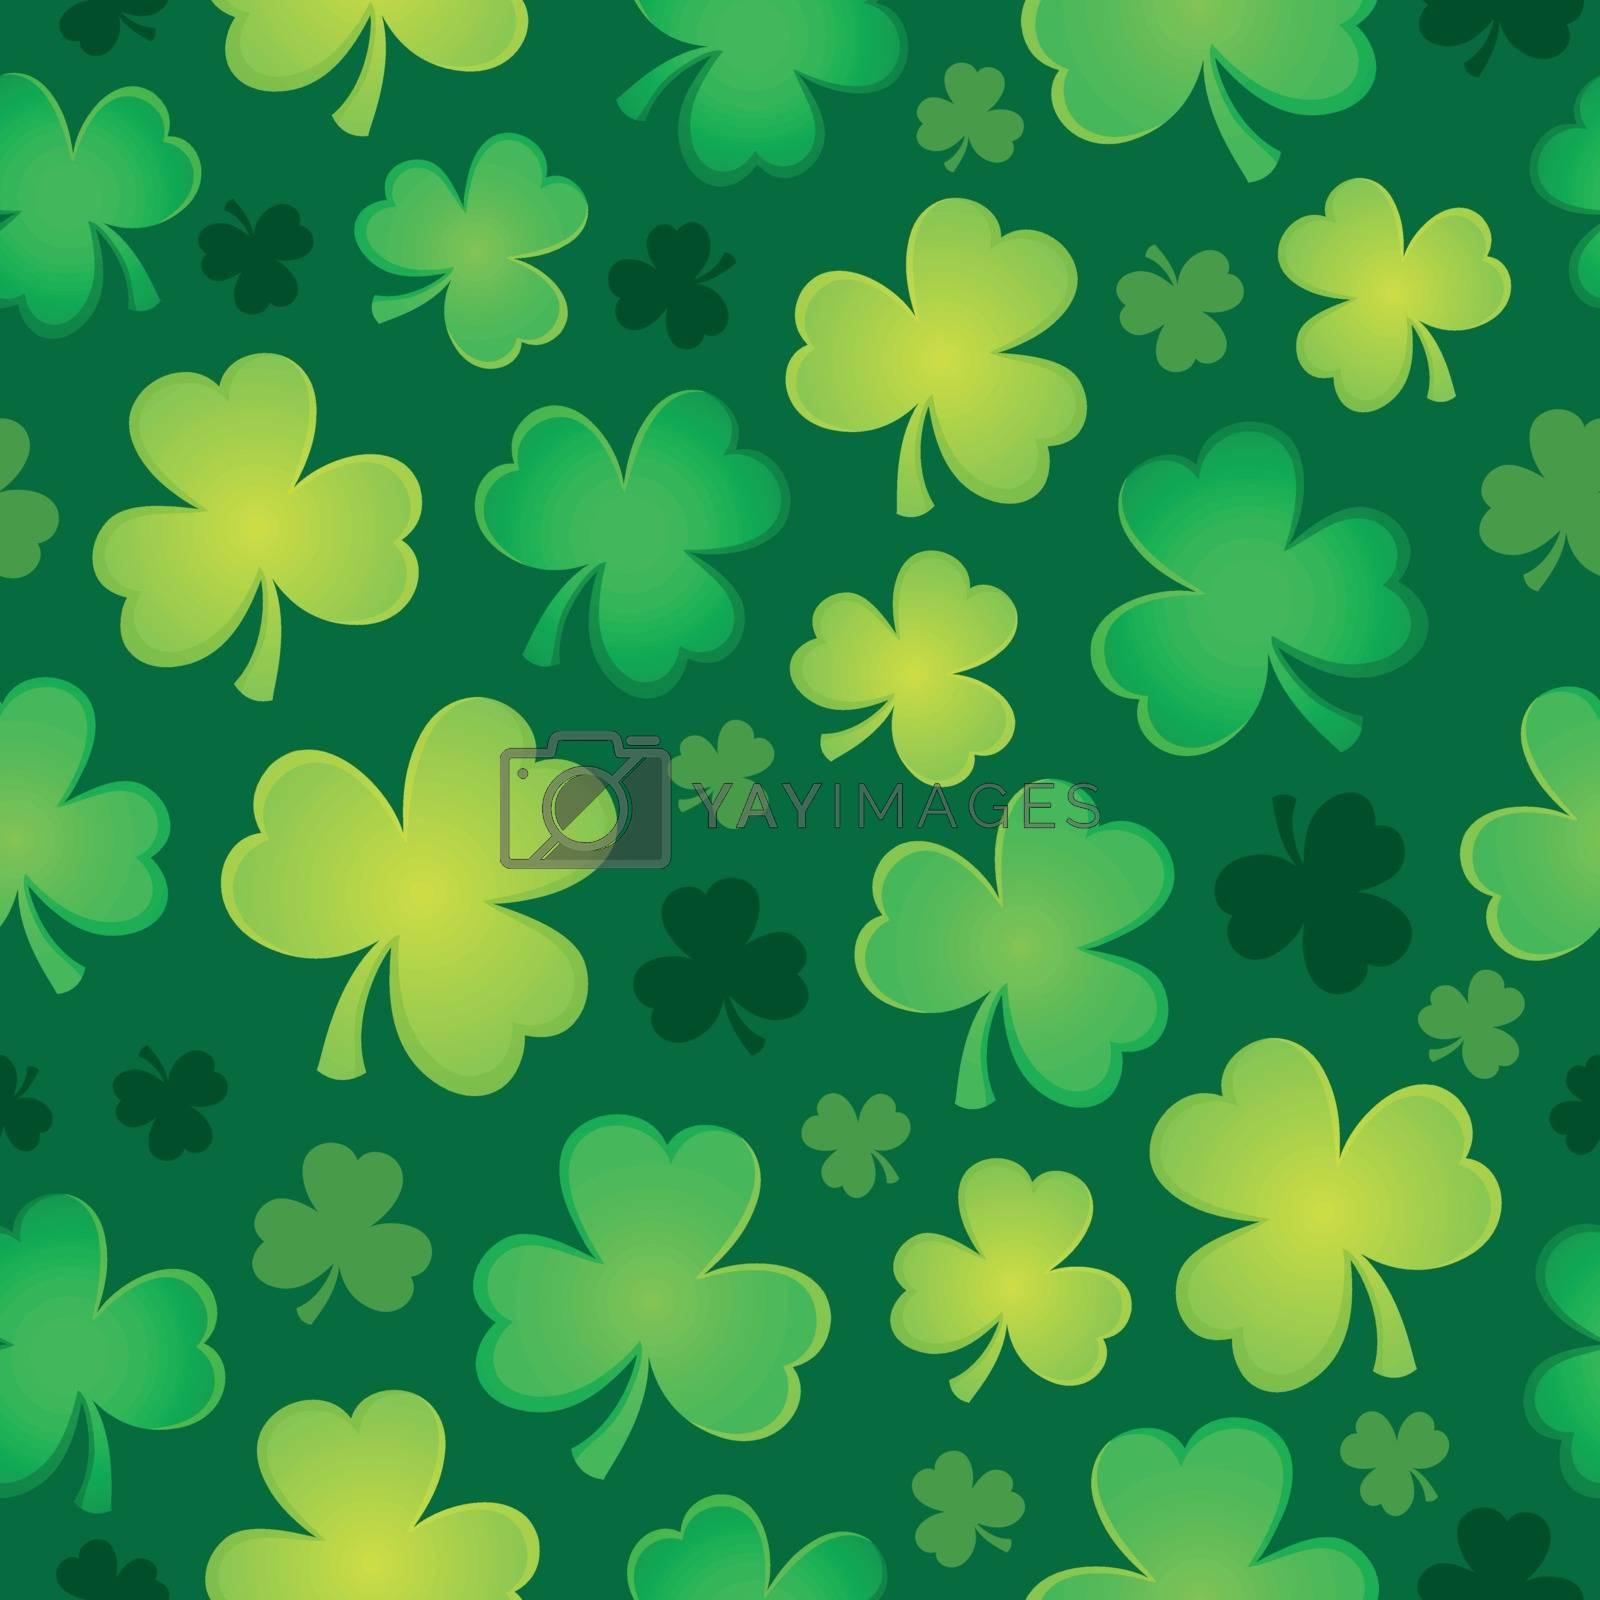 Three leaf clover seamless background 2 - eps10 vector illustration.